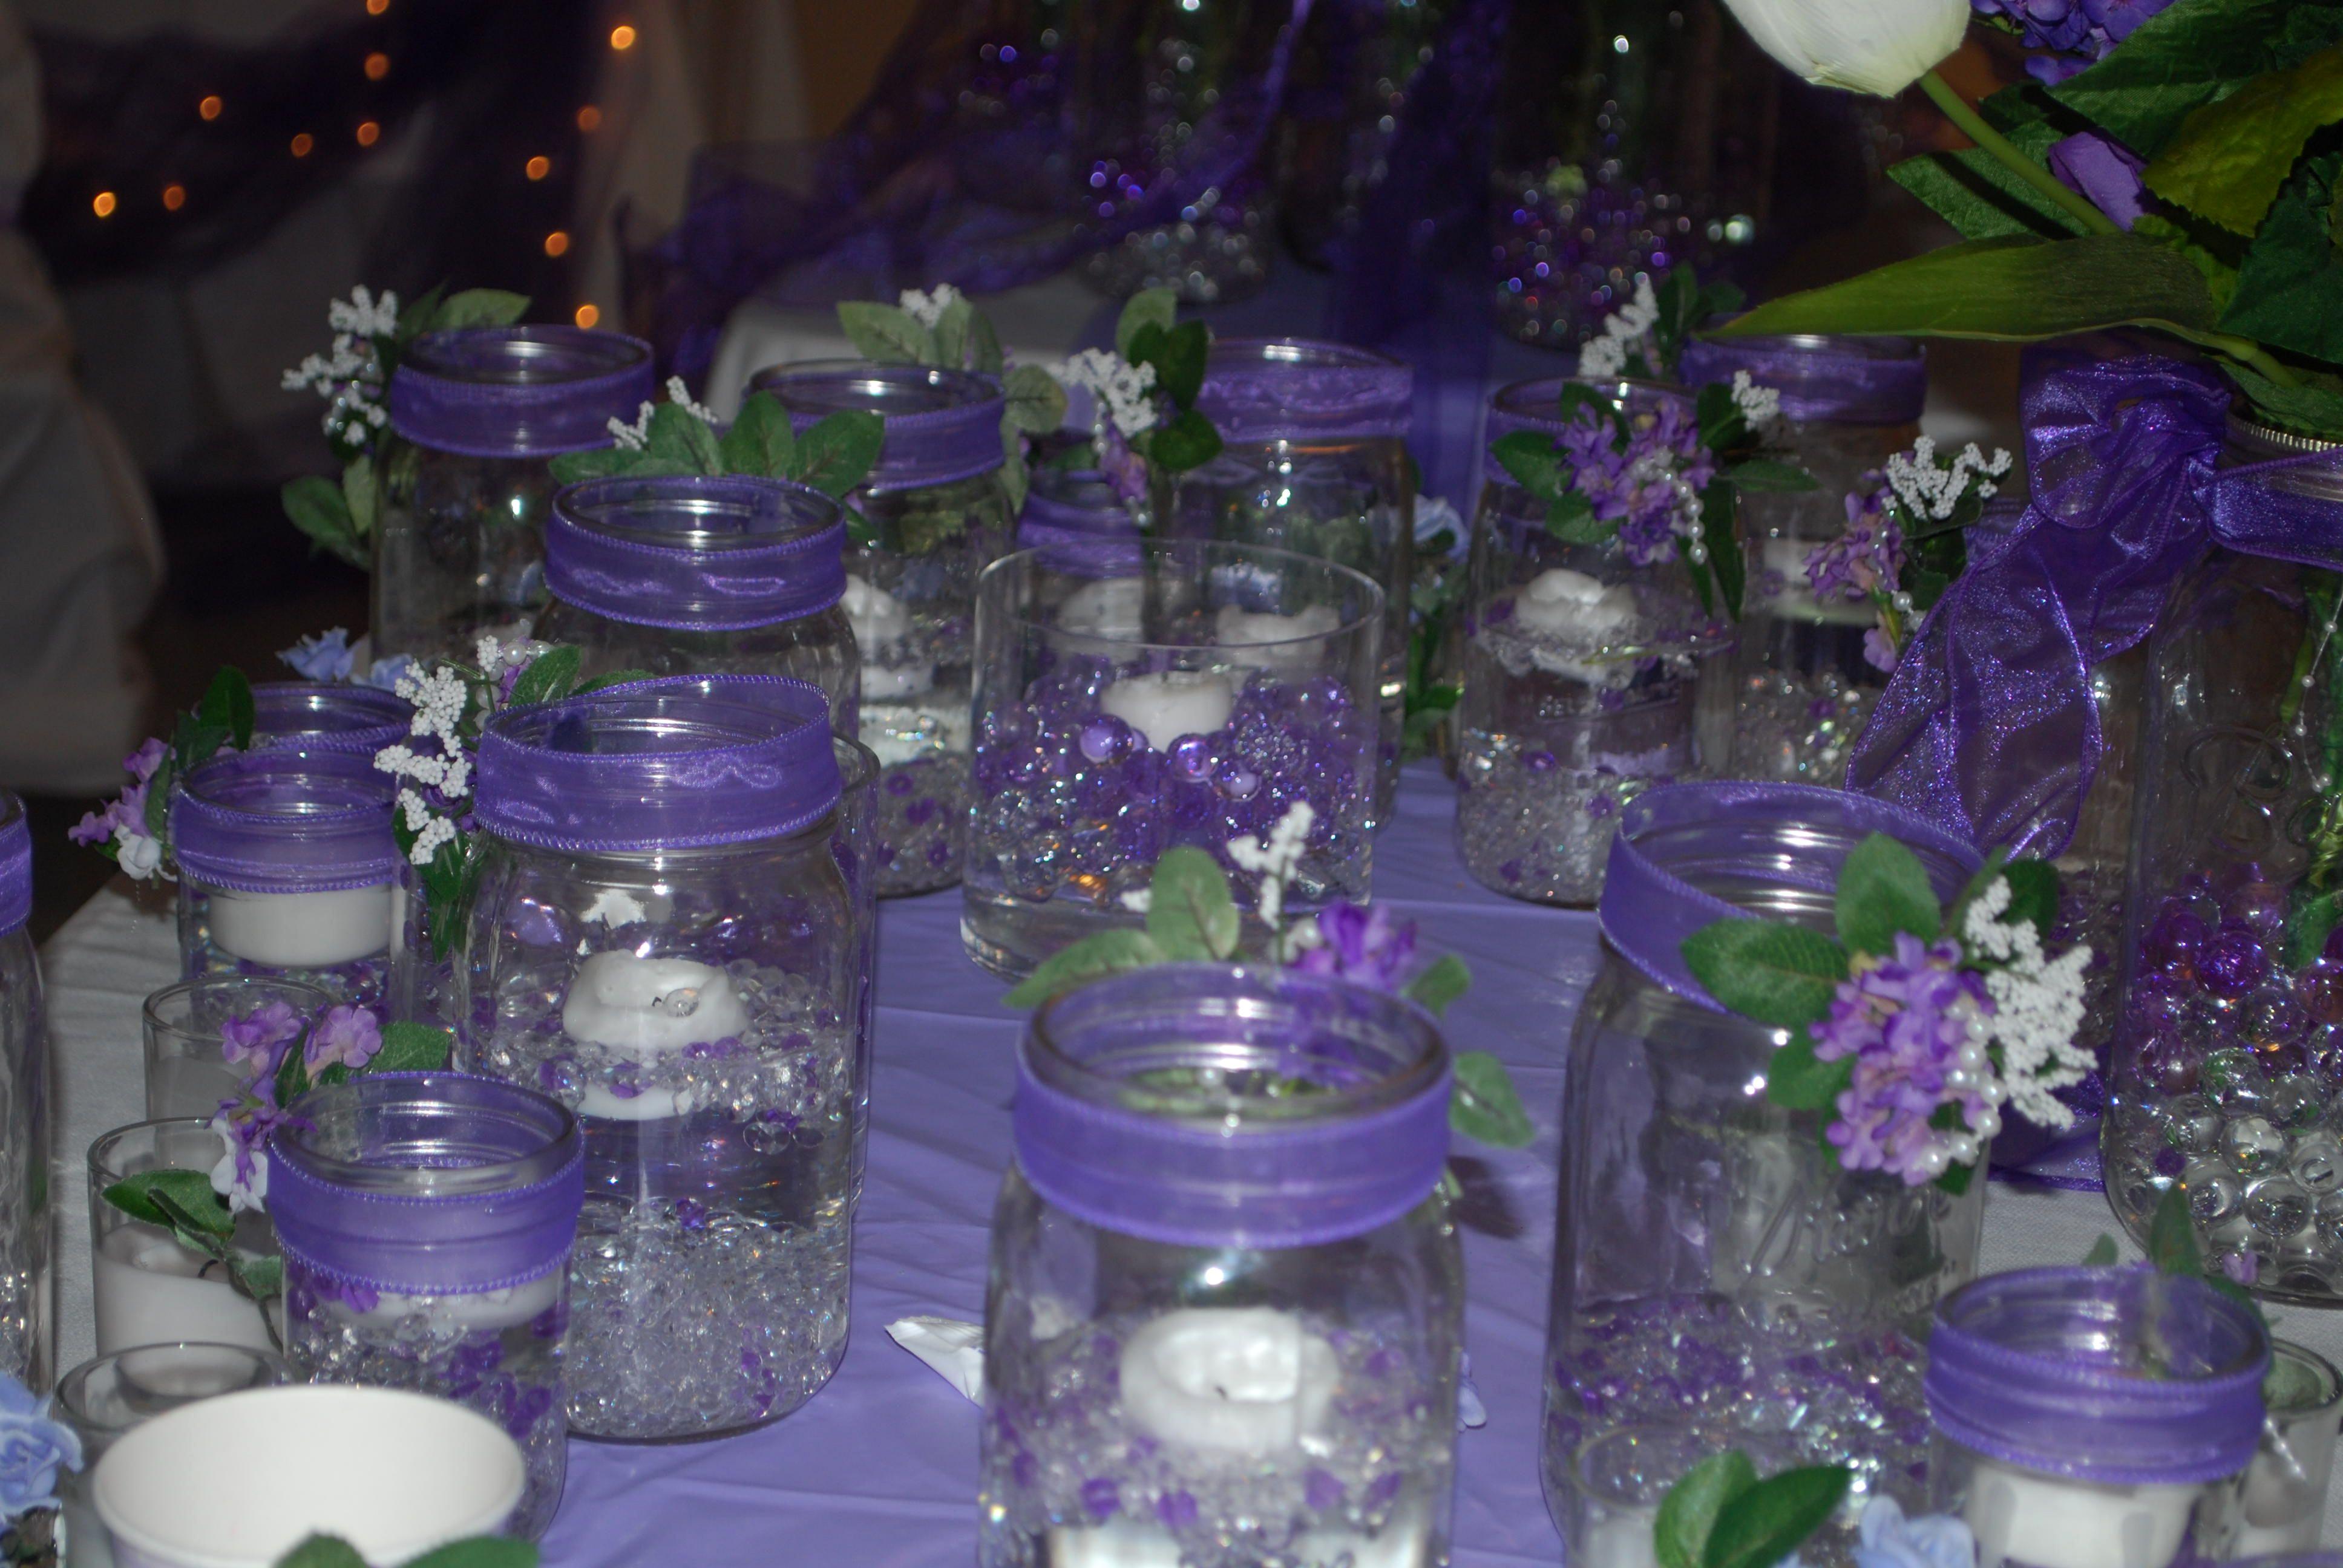 floating candle flower vases of mason jar wedding decorations fresh living room vases wedding within mason jar wedding decorations beautiful mason jars filled with water beads floating candles and water of